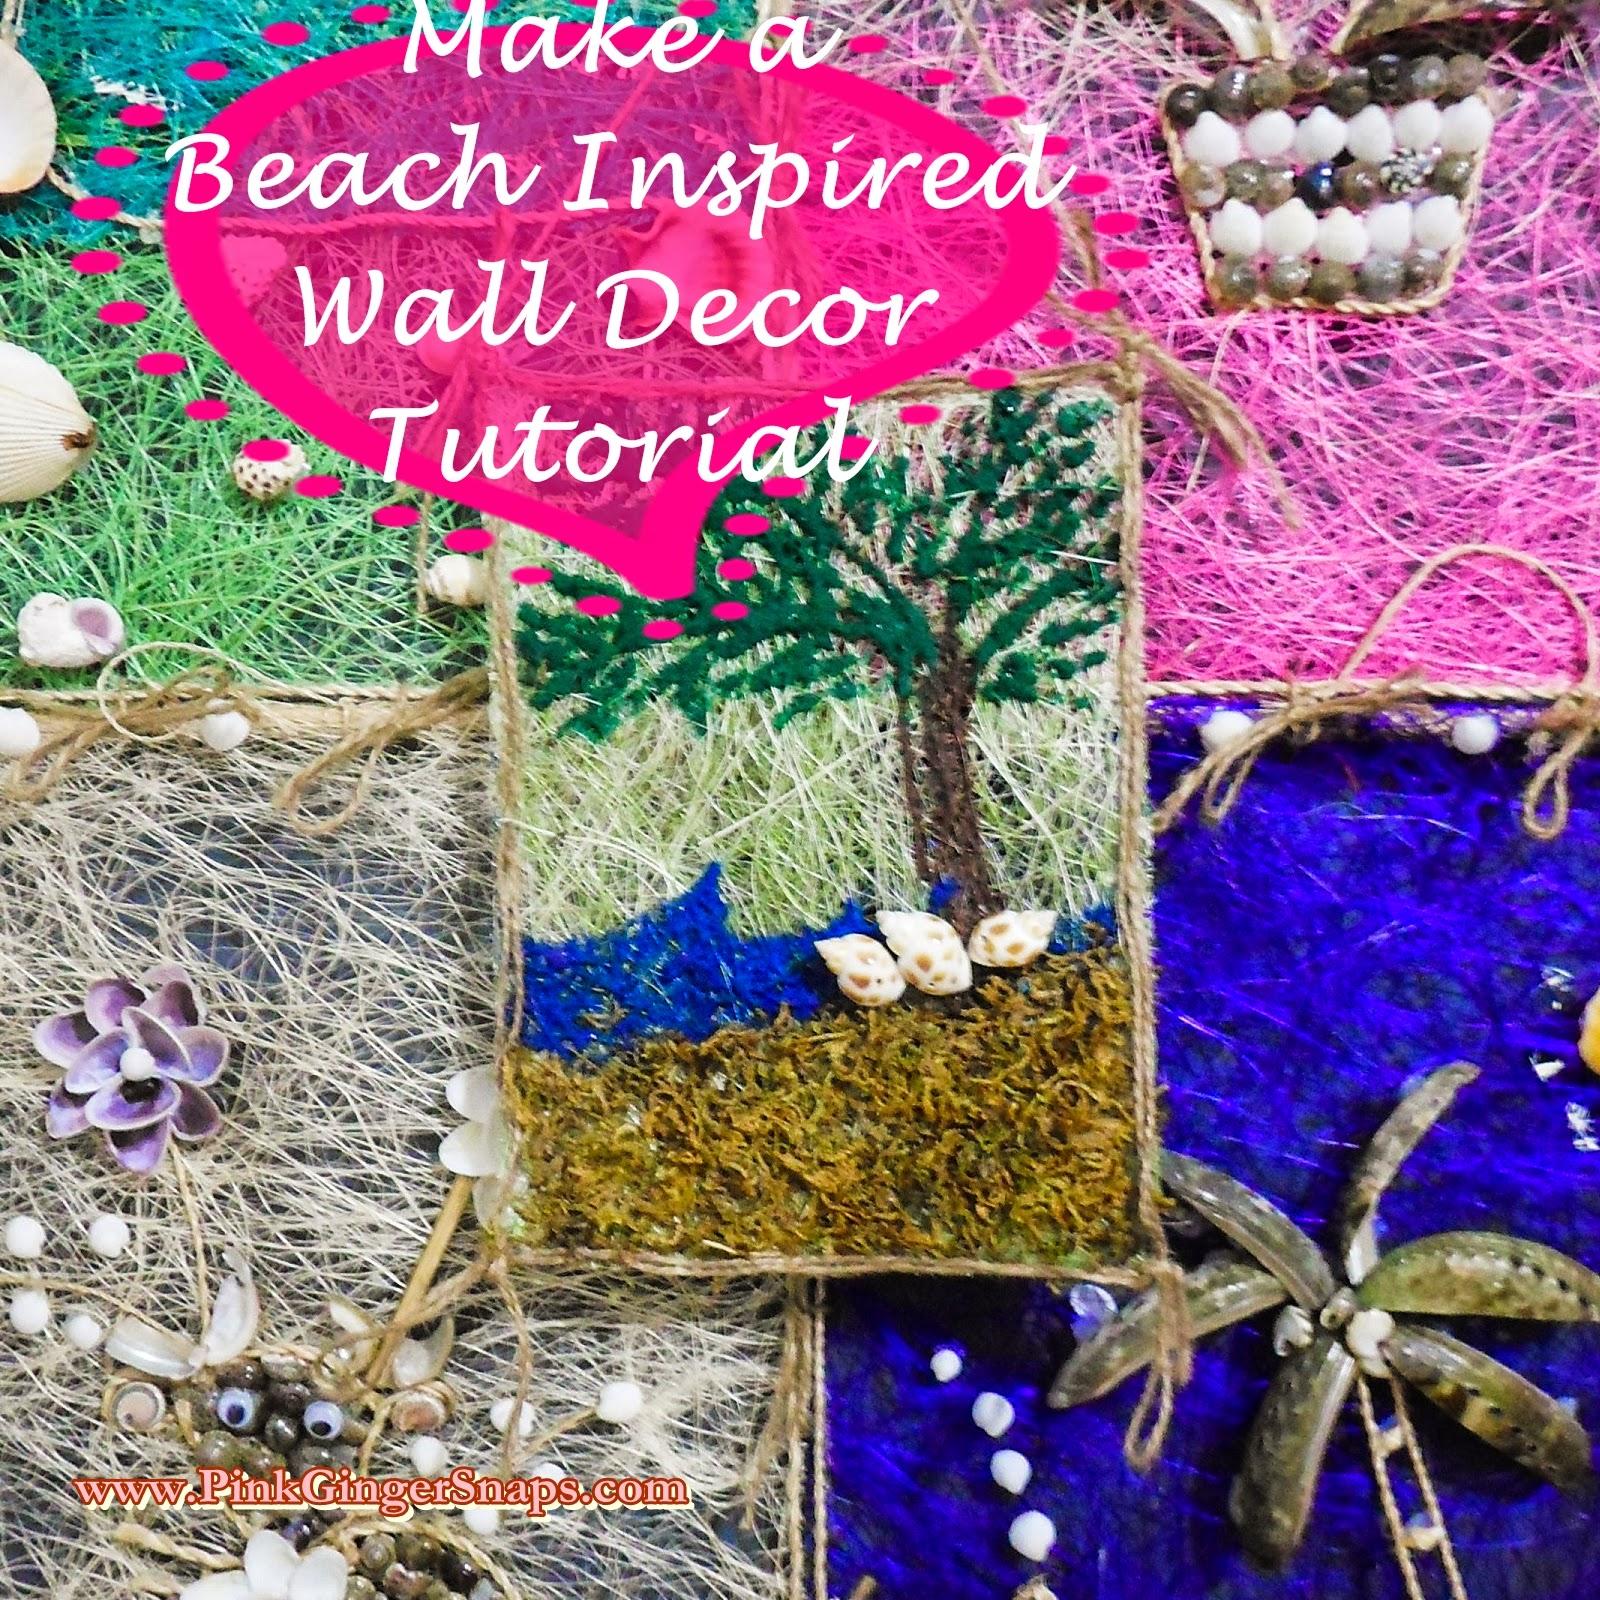 Make a beach inspired wall decor DIY